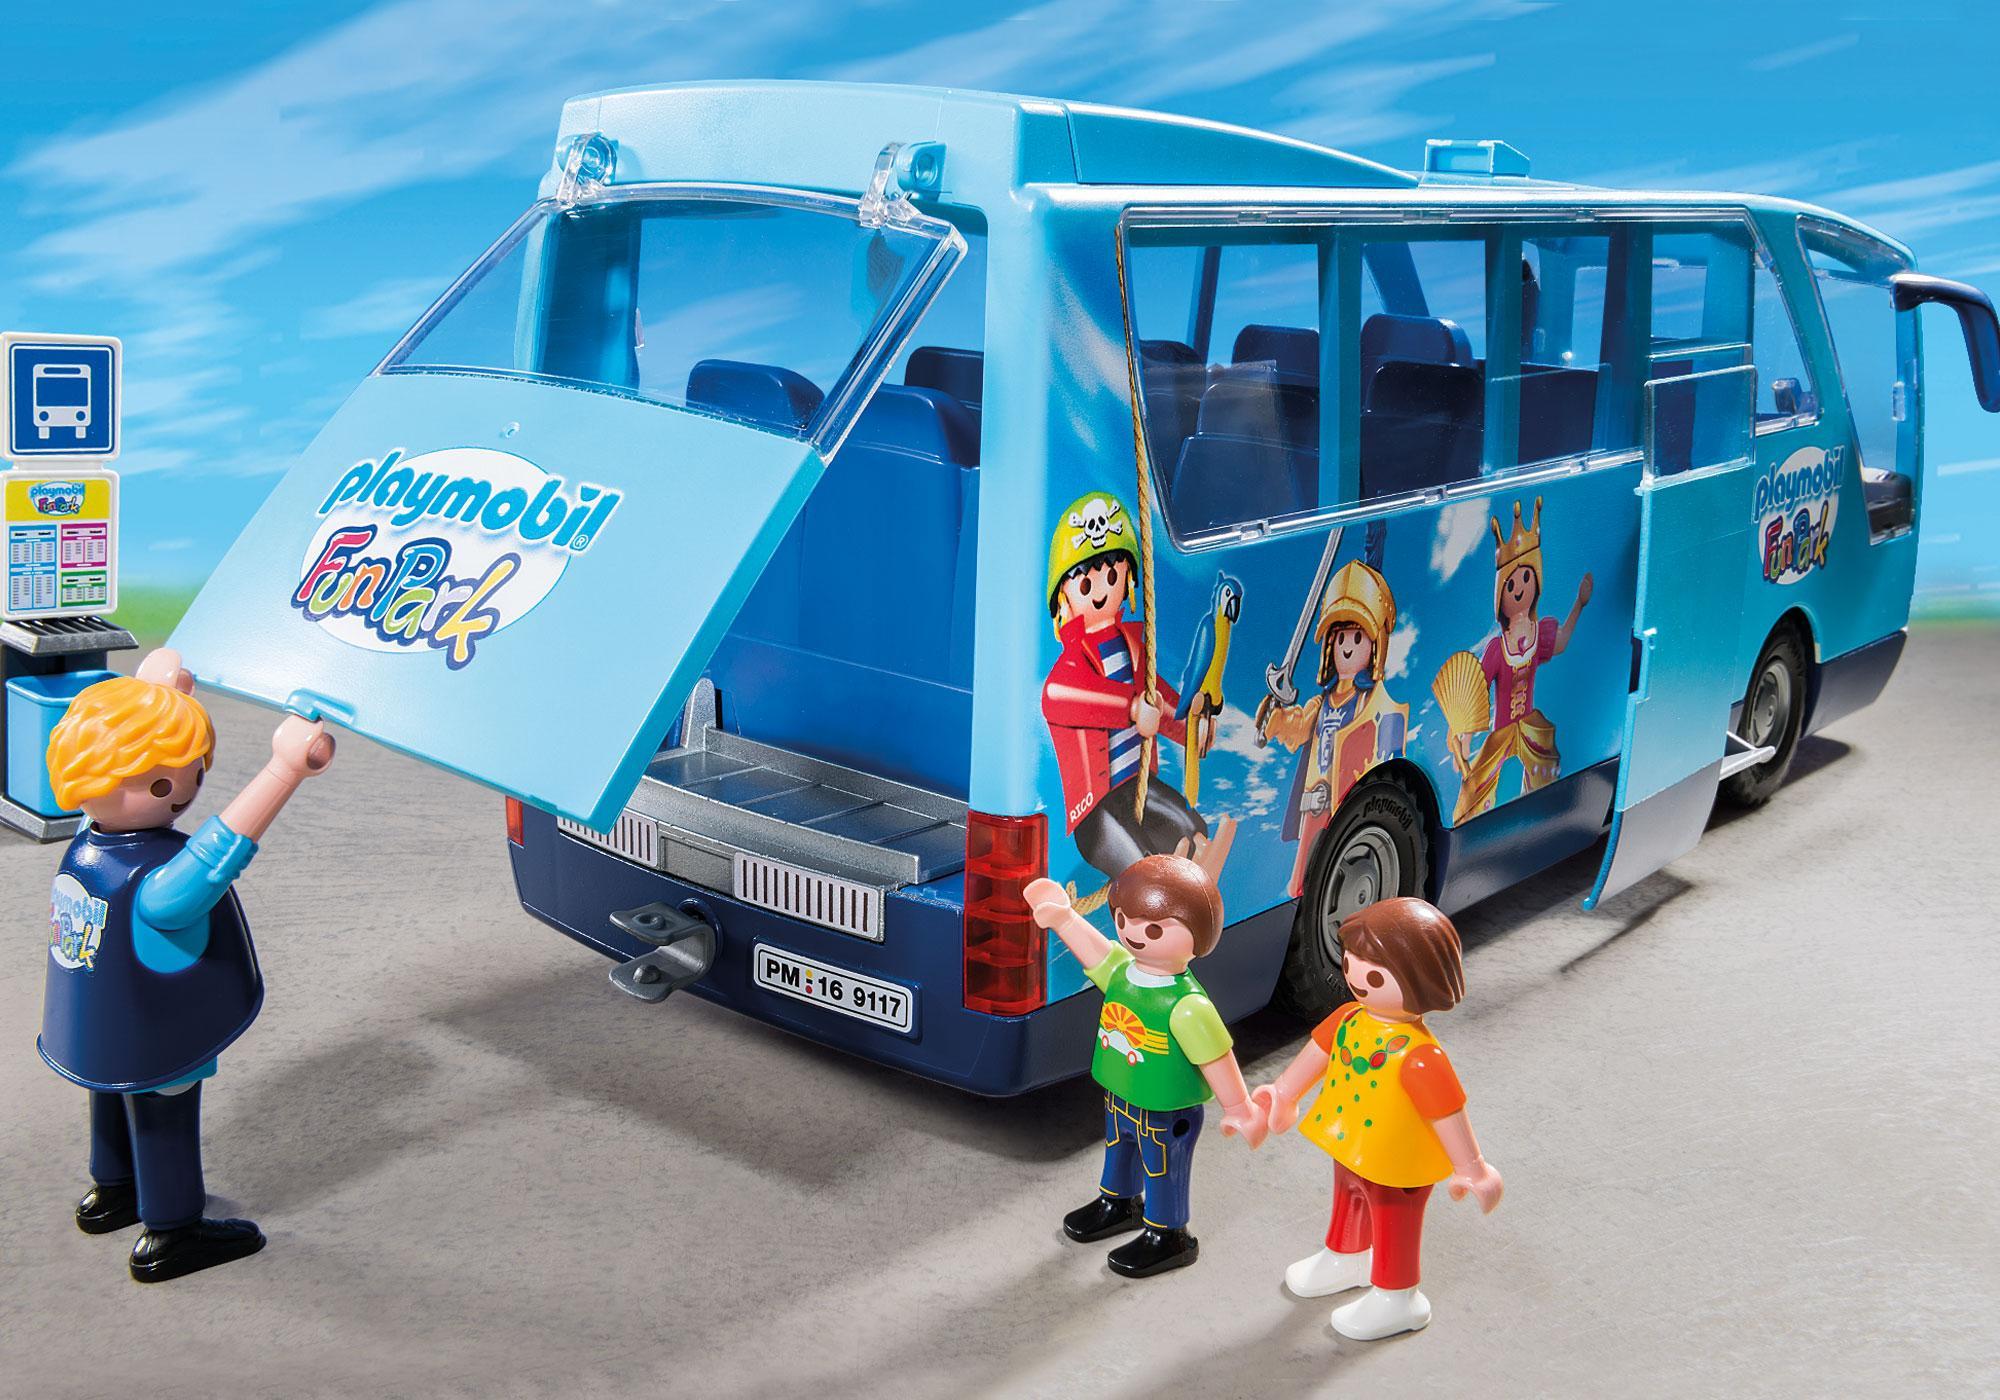 http://media.playmobil.com/i/playmobil/9117_product_extra3